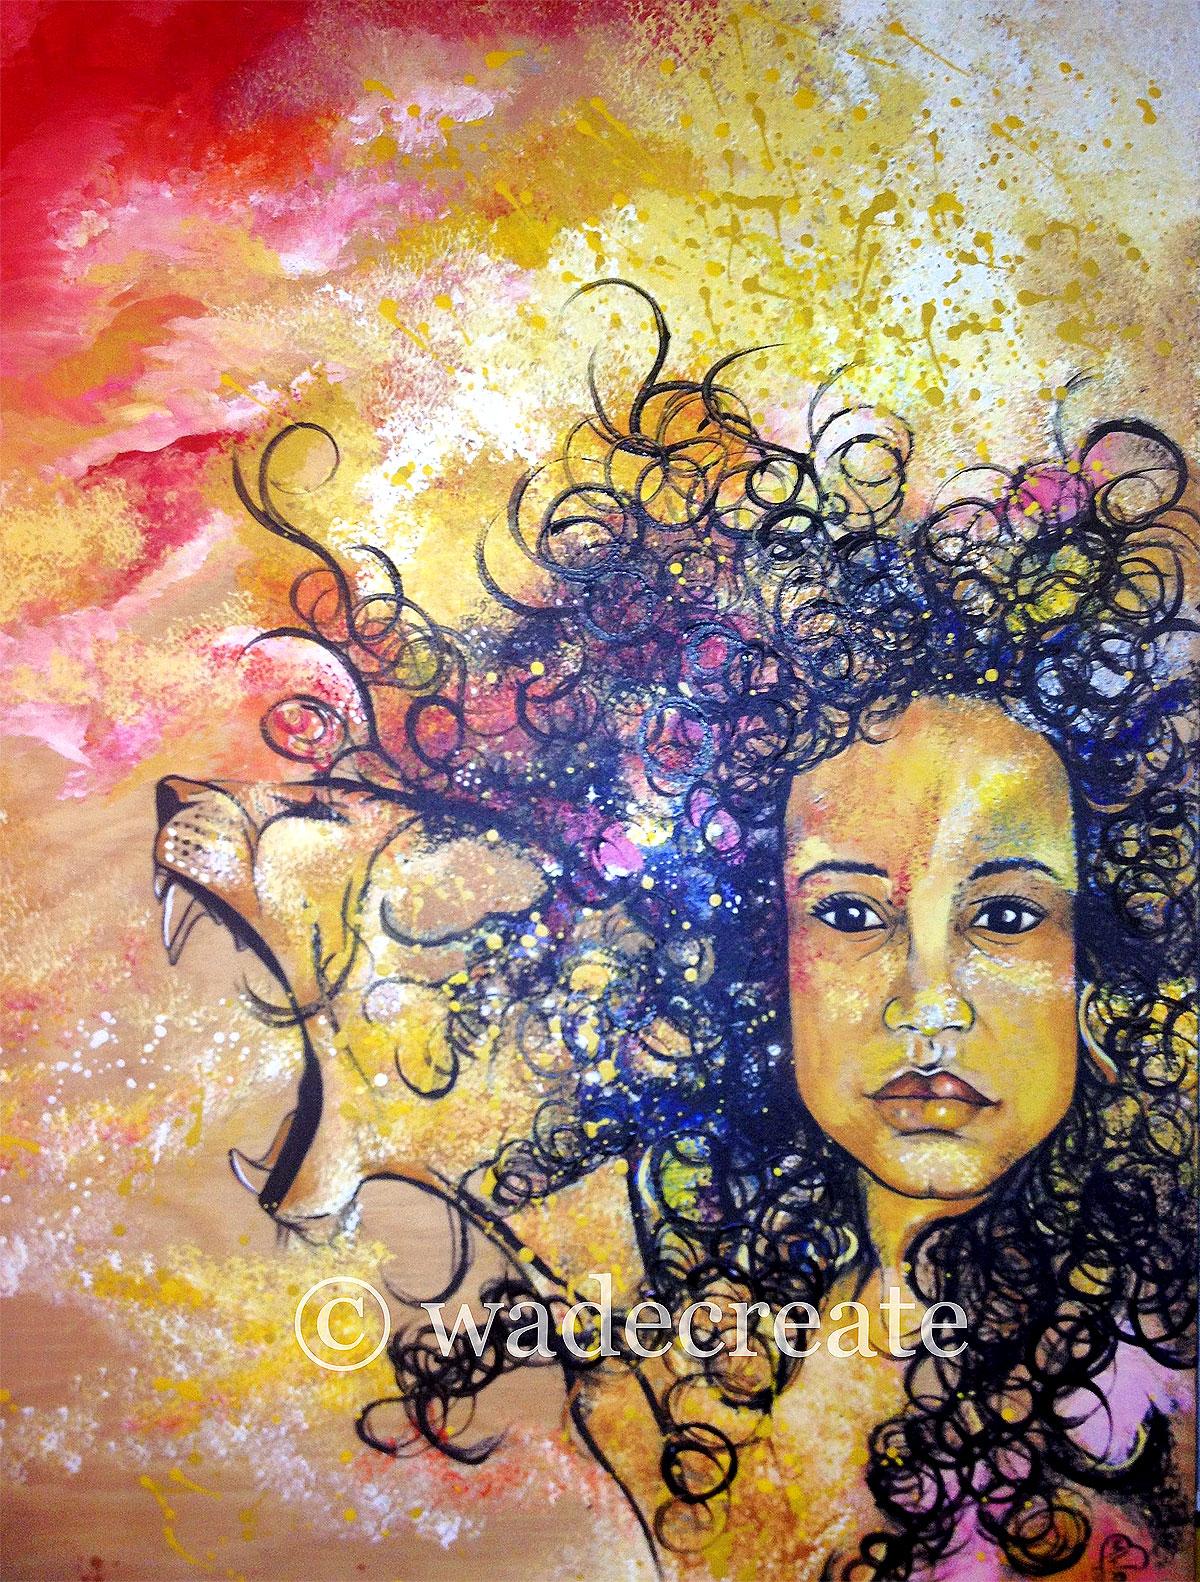 Lionhearted (Self Portrait)